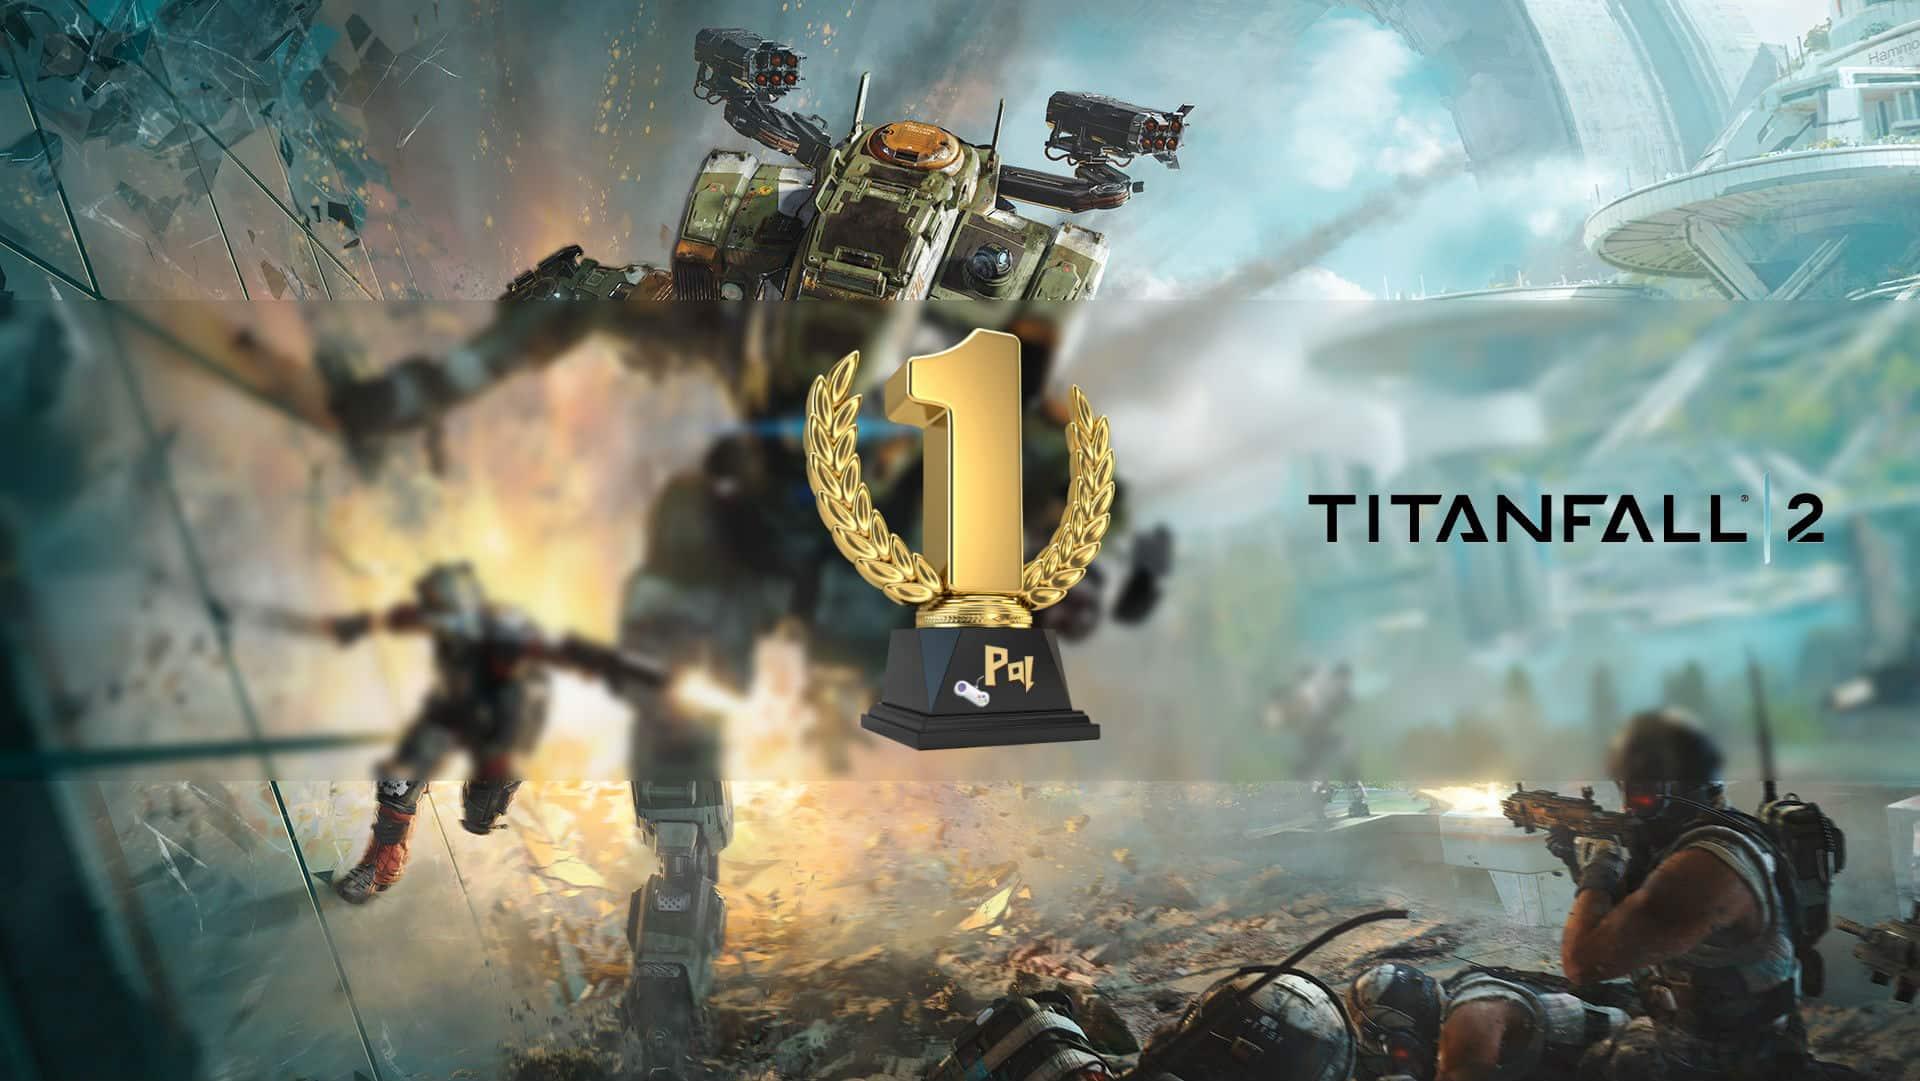 Titanfall-2-1stpal.com